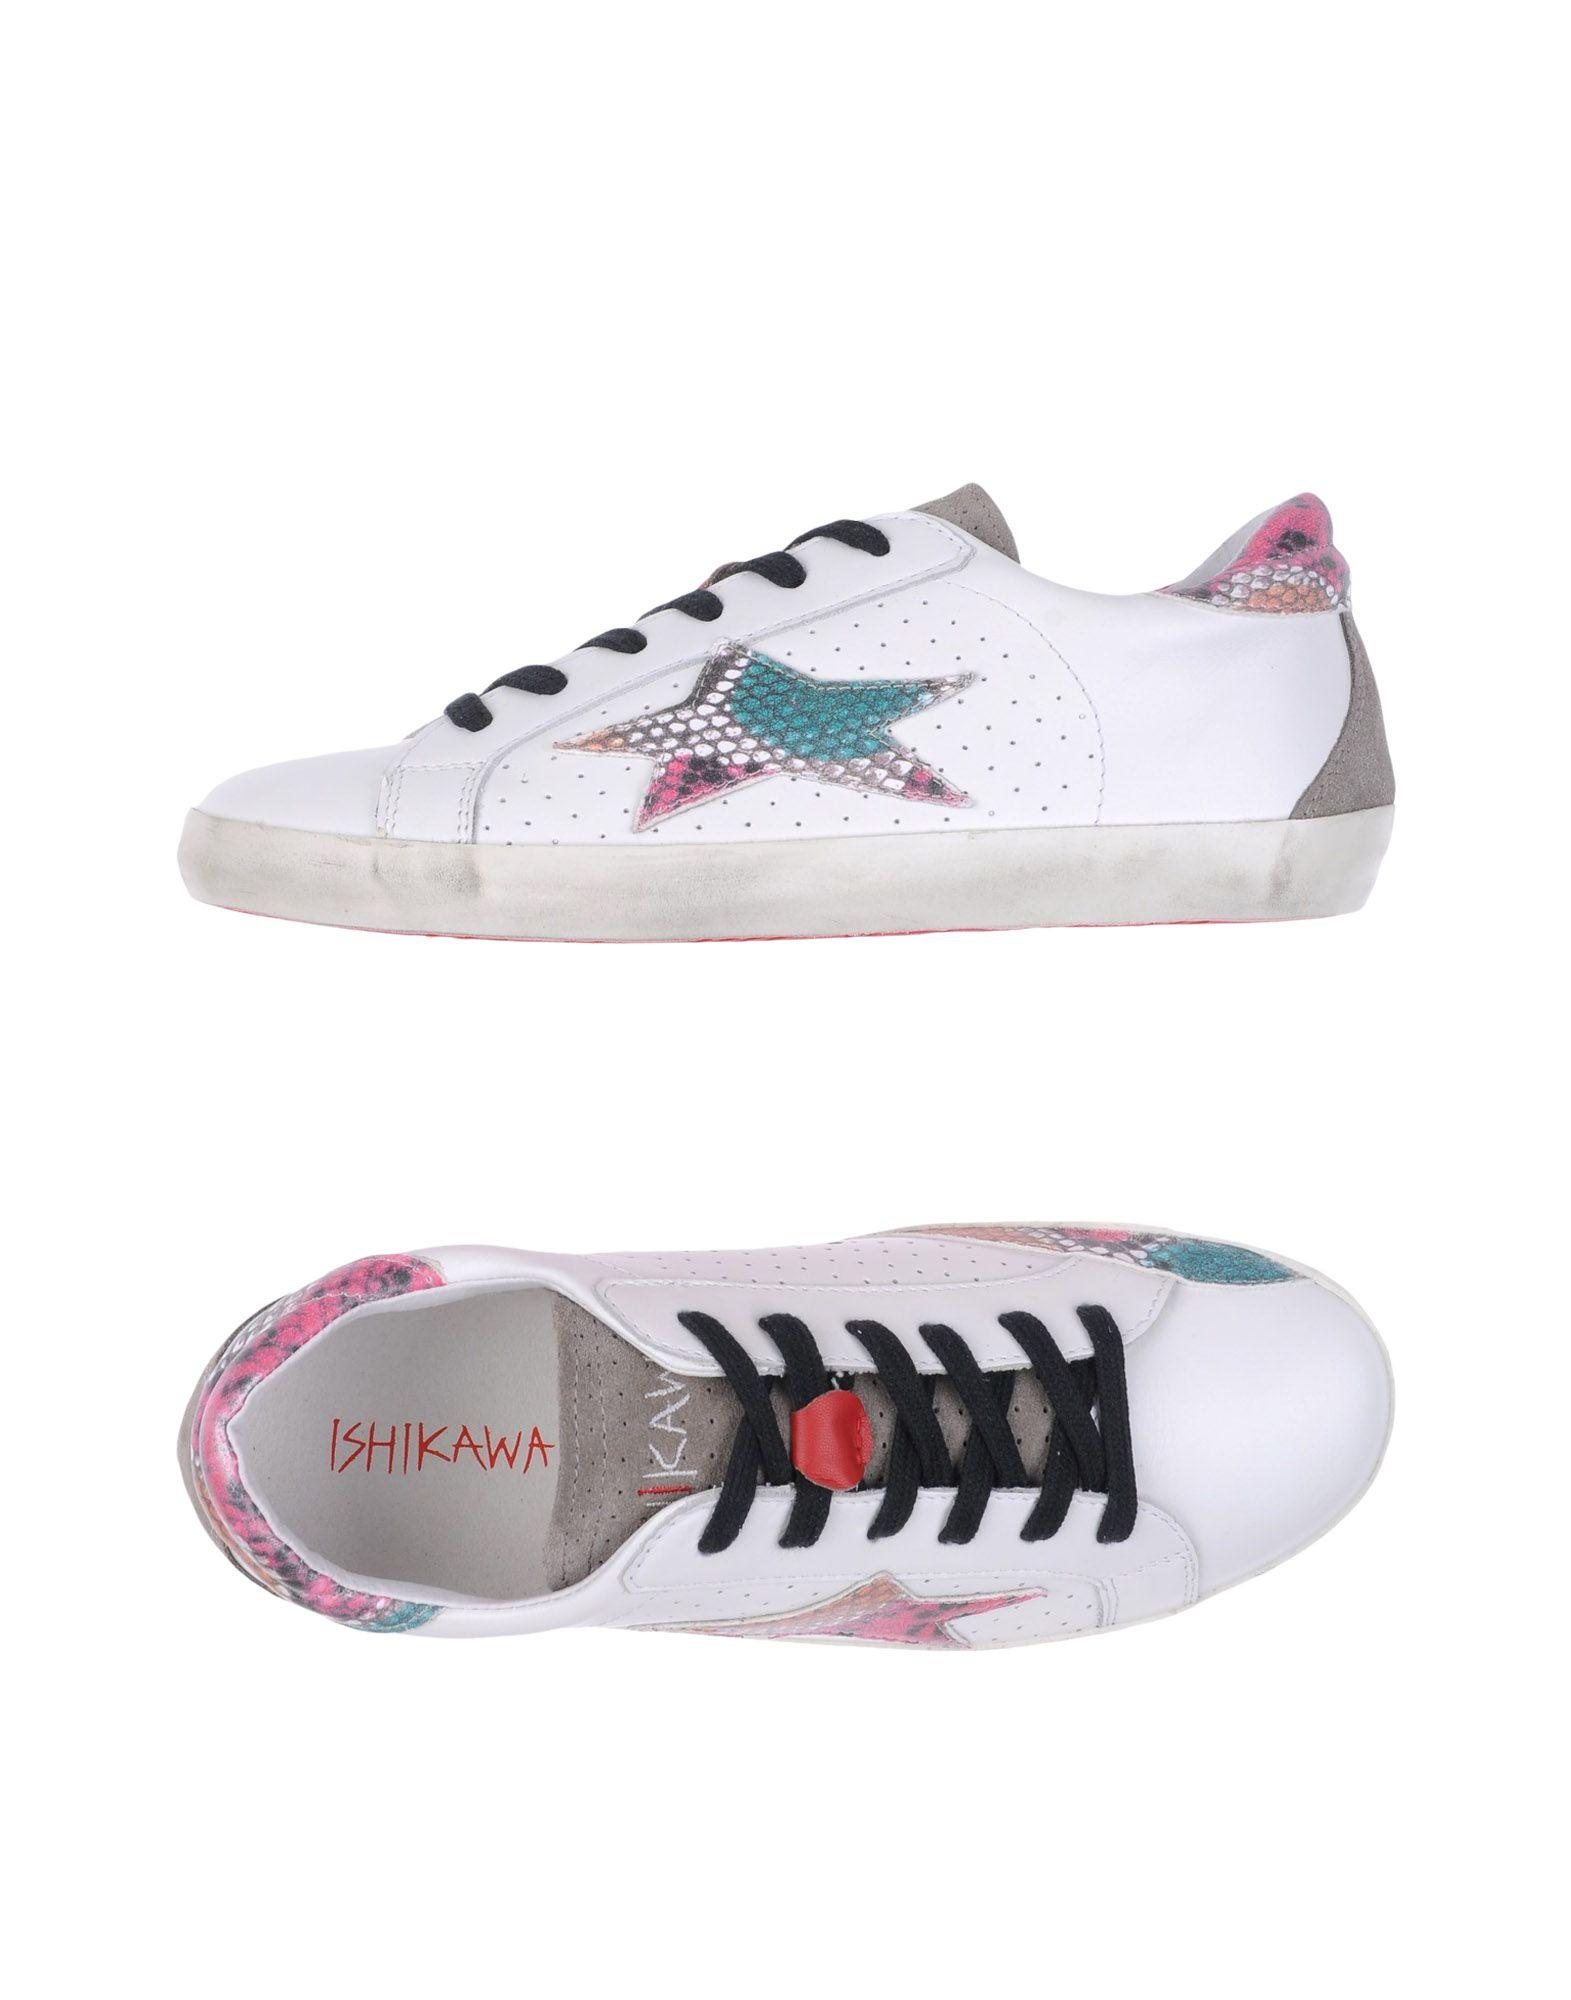 Sneakers Ishikawa Uomo - Acquista online su